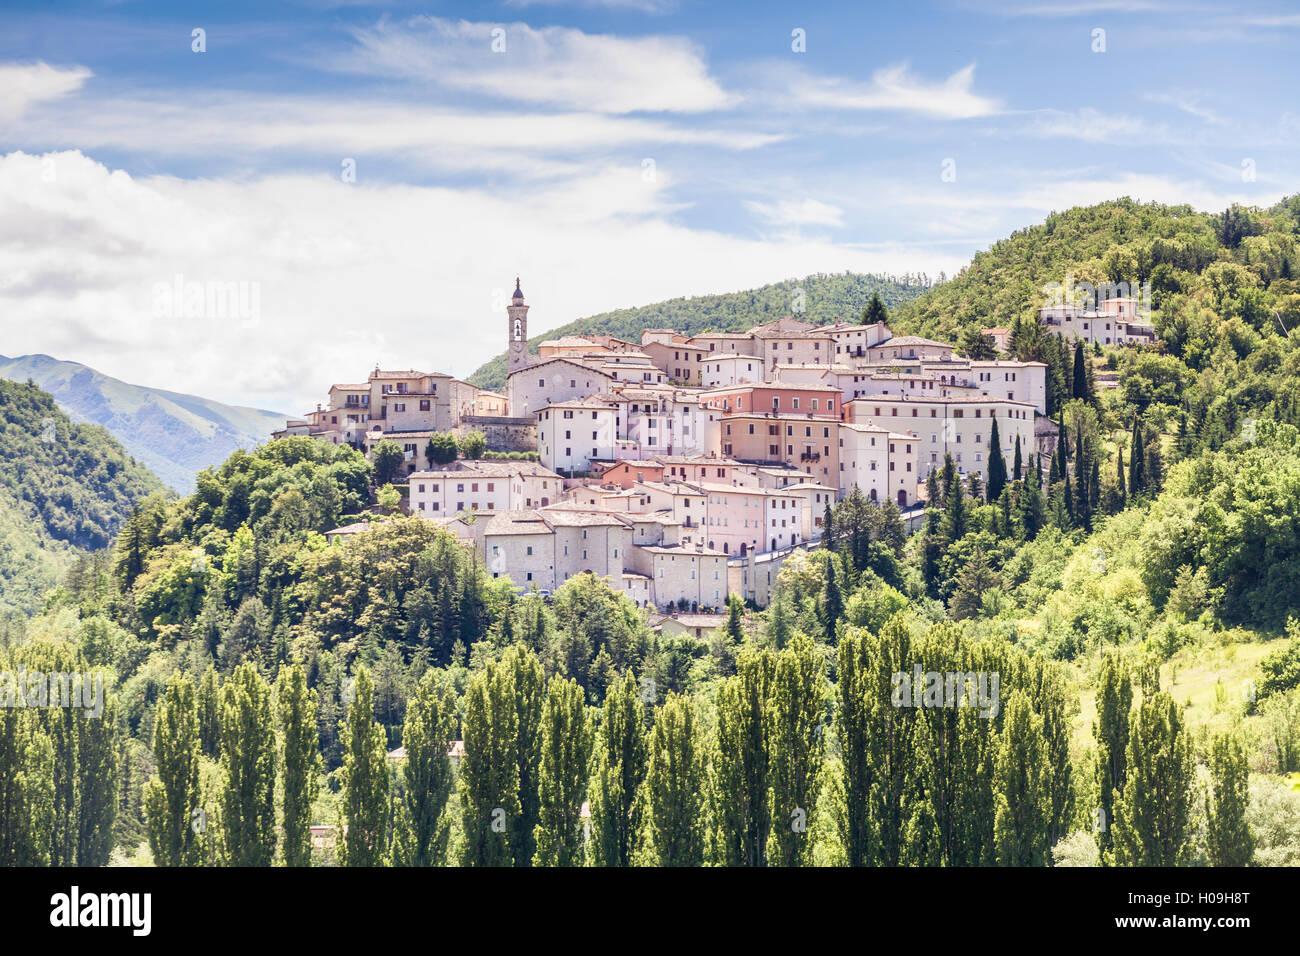 The village of Preci in the Monti Sibillini National Park, Umbria, Italy, Europe - Stock Image